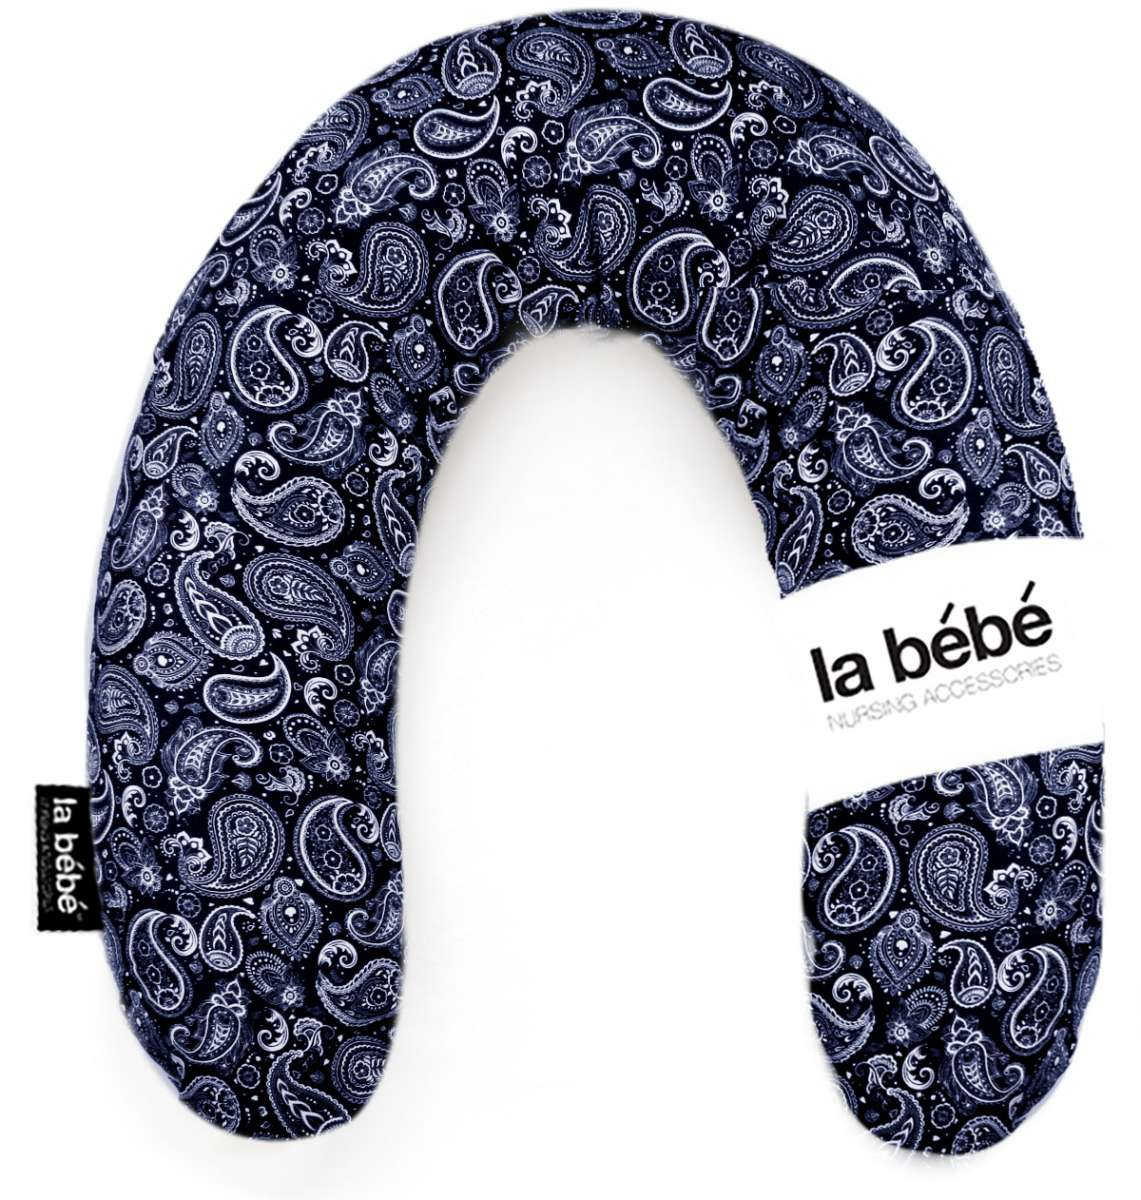 La Bebe Rich Cotton Nursing Maternity Pillow Eastern Mod Dark Blue Pakaviņš pakavs mazuļa barošanai, gulēšanai